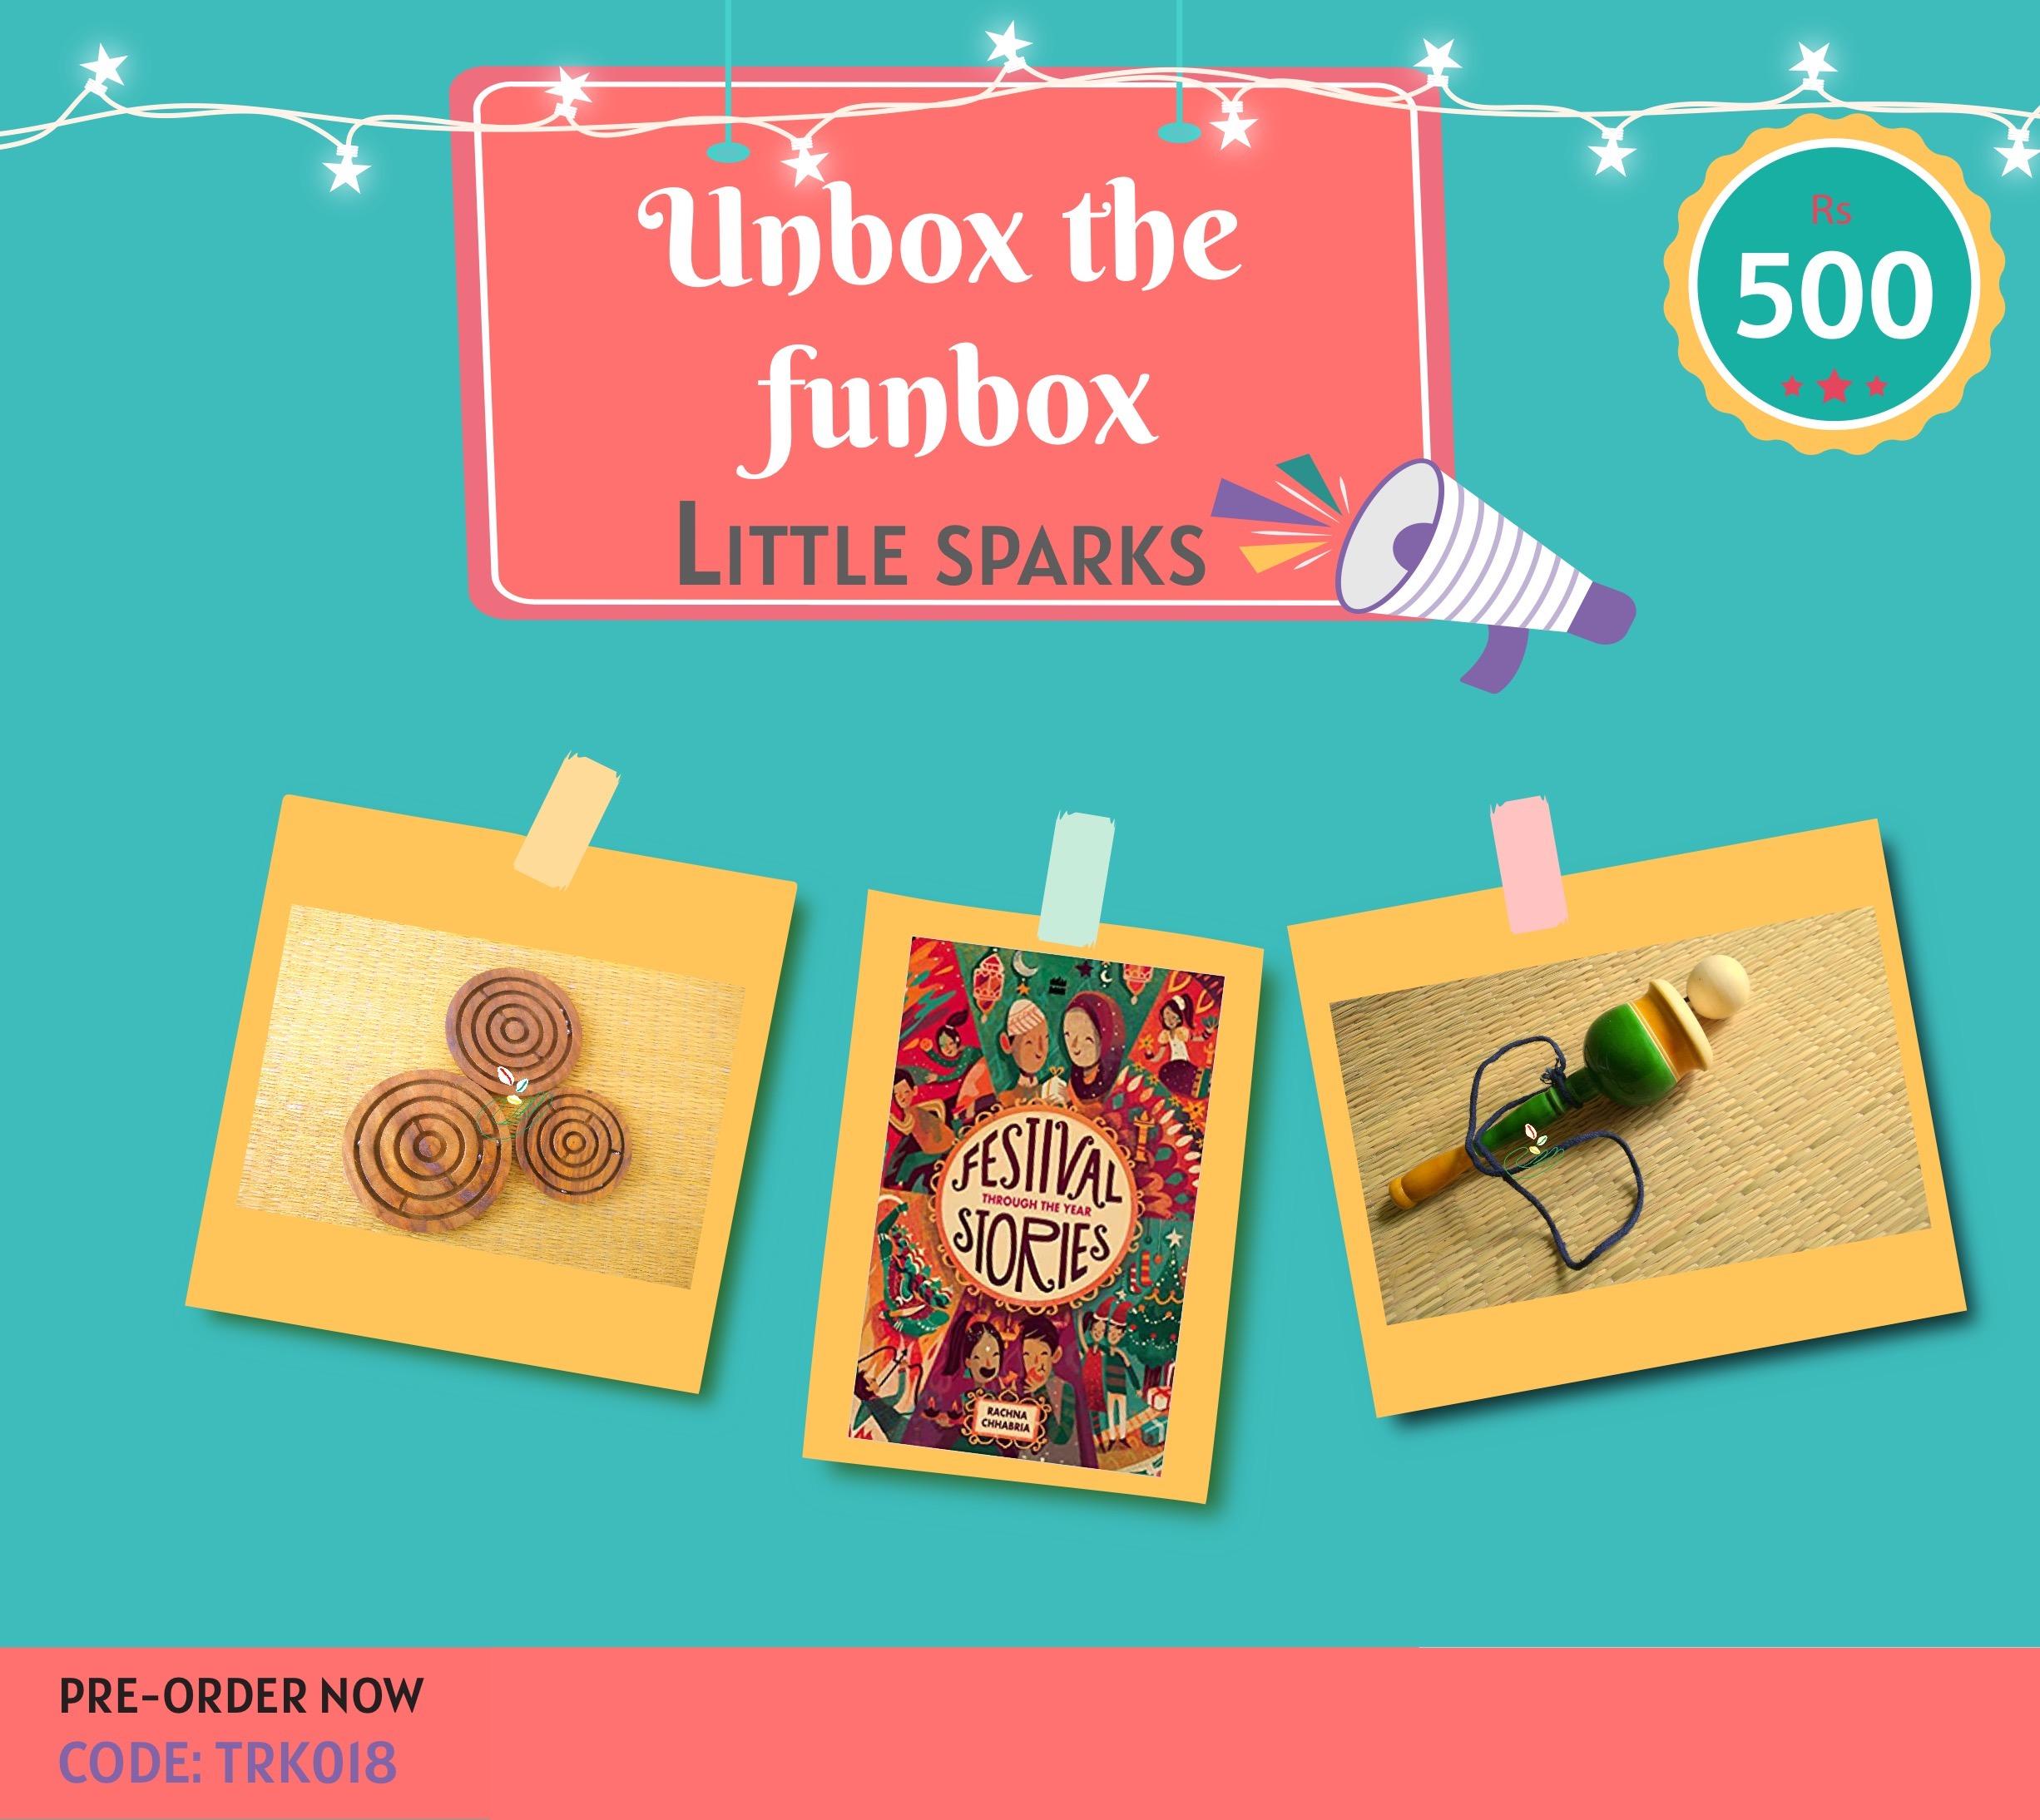 Giftbox Little Sparks [TRK 018]